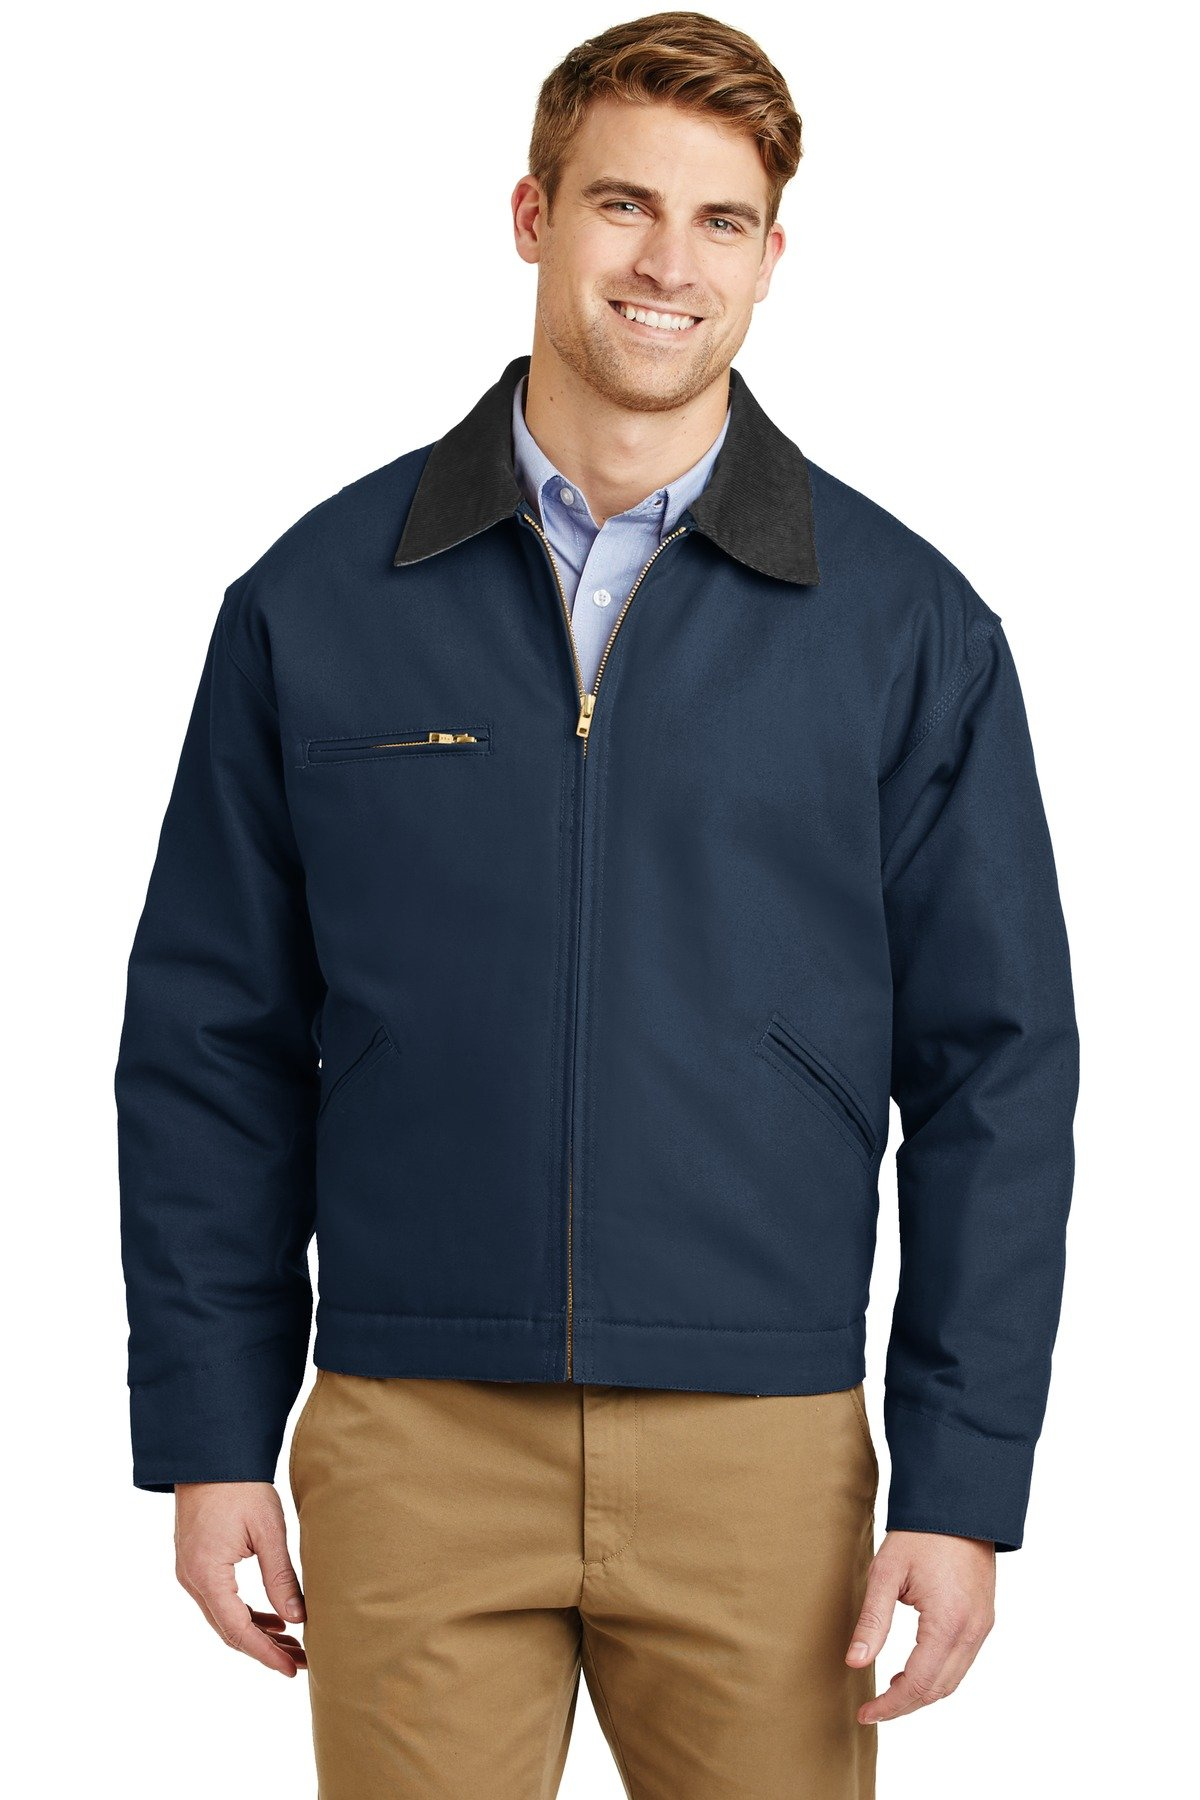 cf206c7c9d9 CornerStone® - Duck Cloth Work Jacket. J763